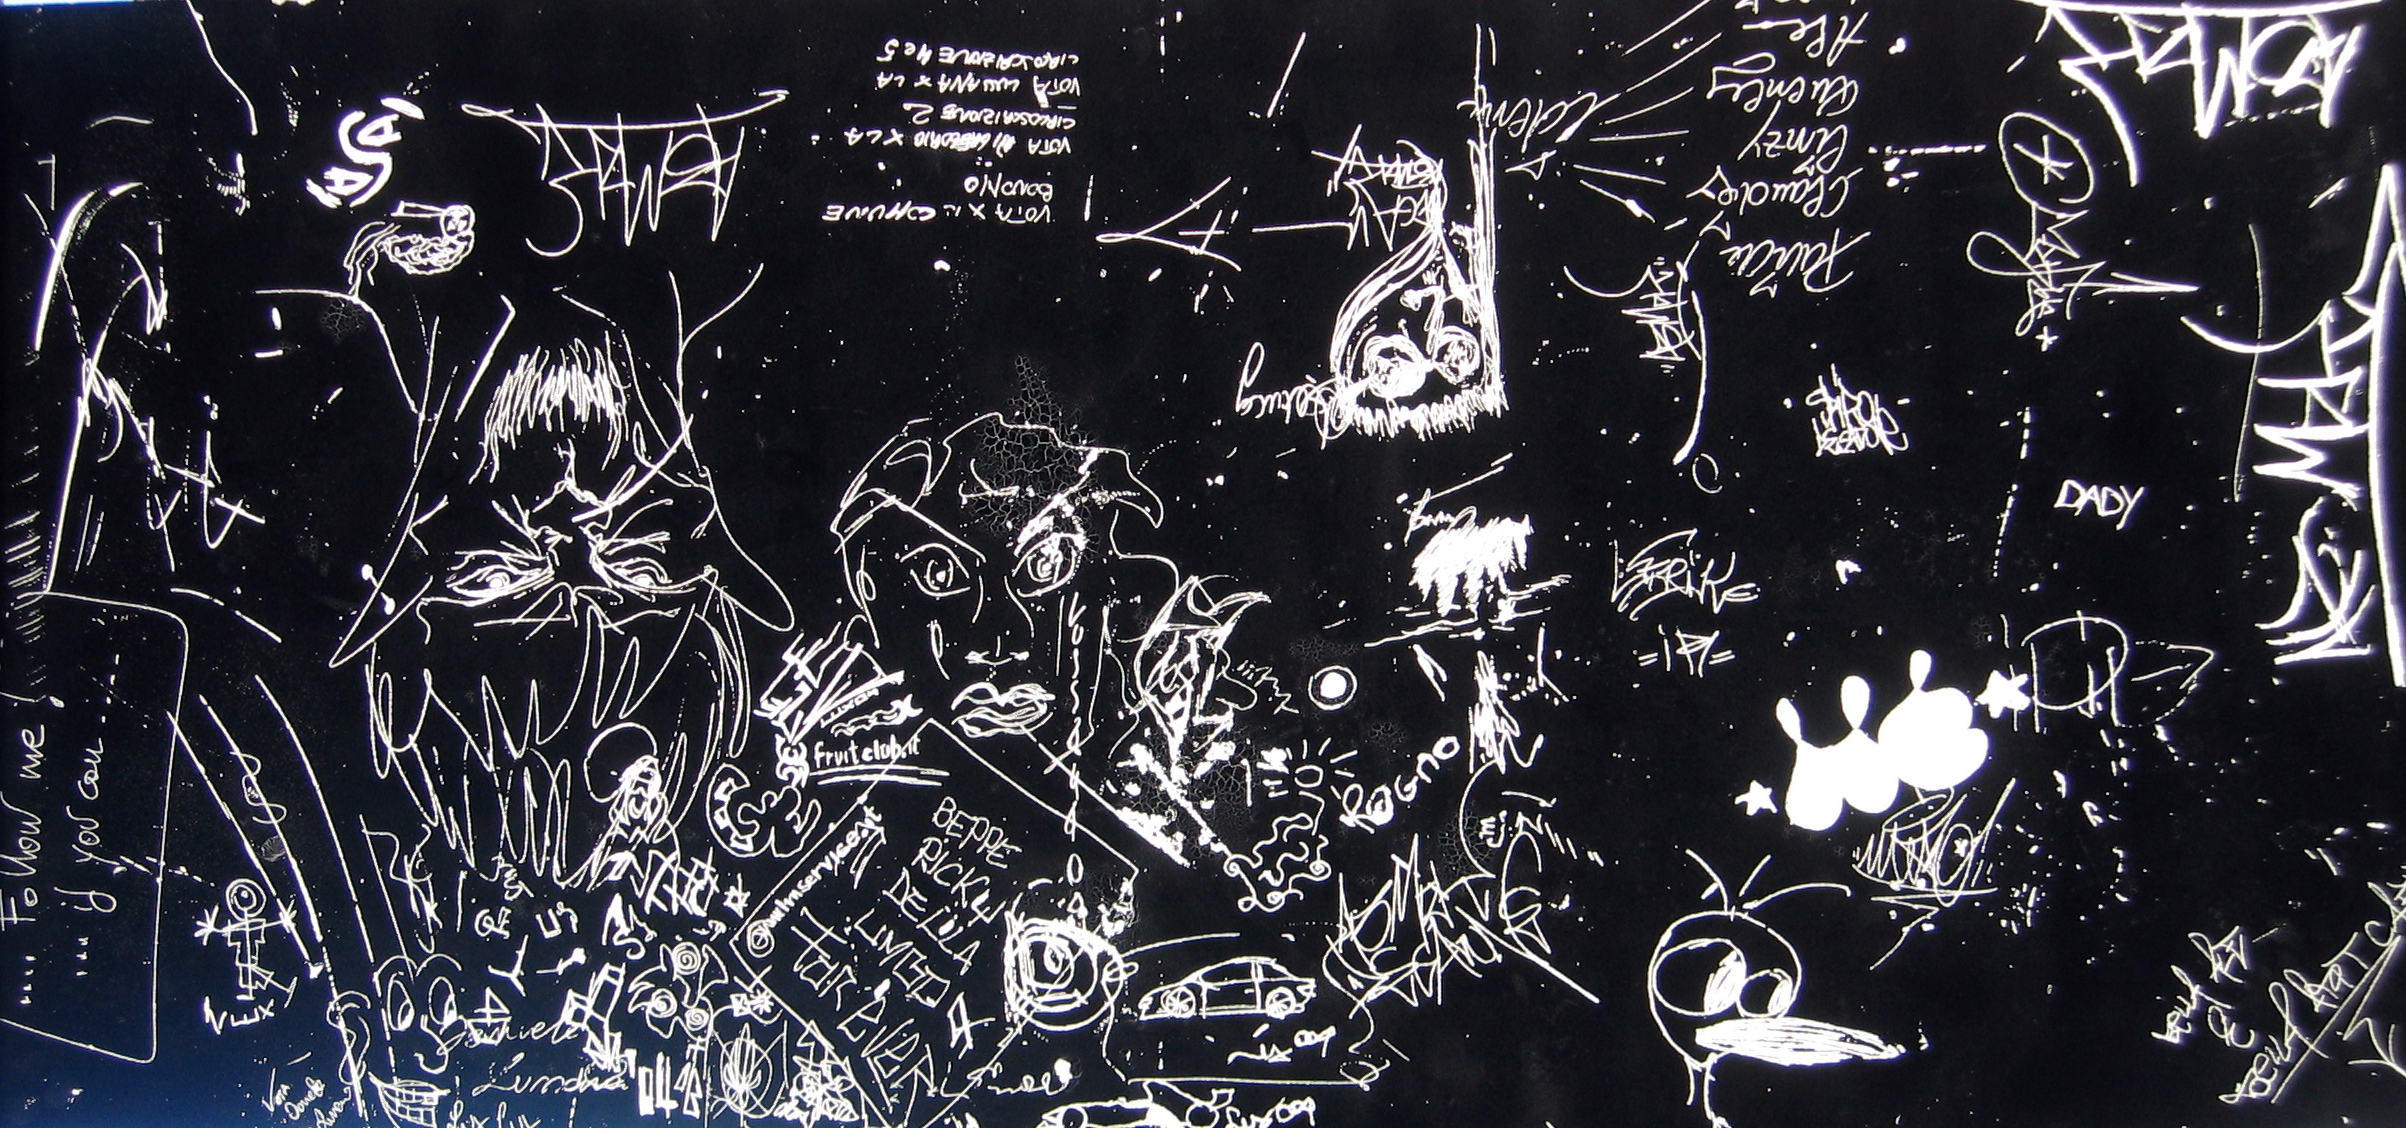 Salvatore Falci, 1986 - 2006, Vetro Art caffè BEPPE